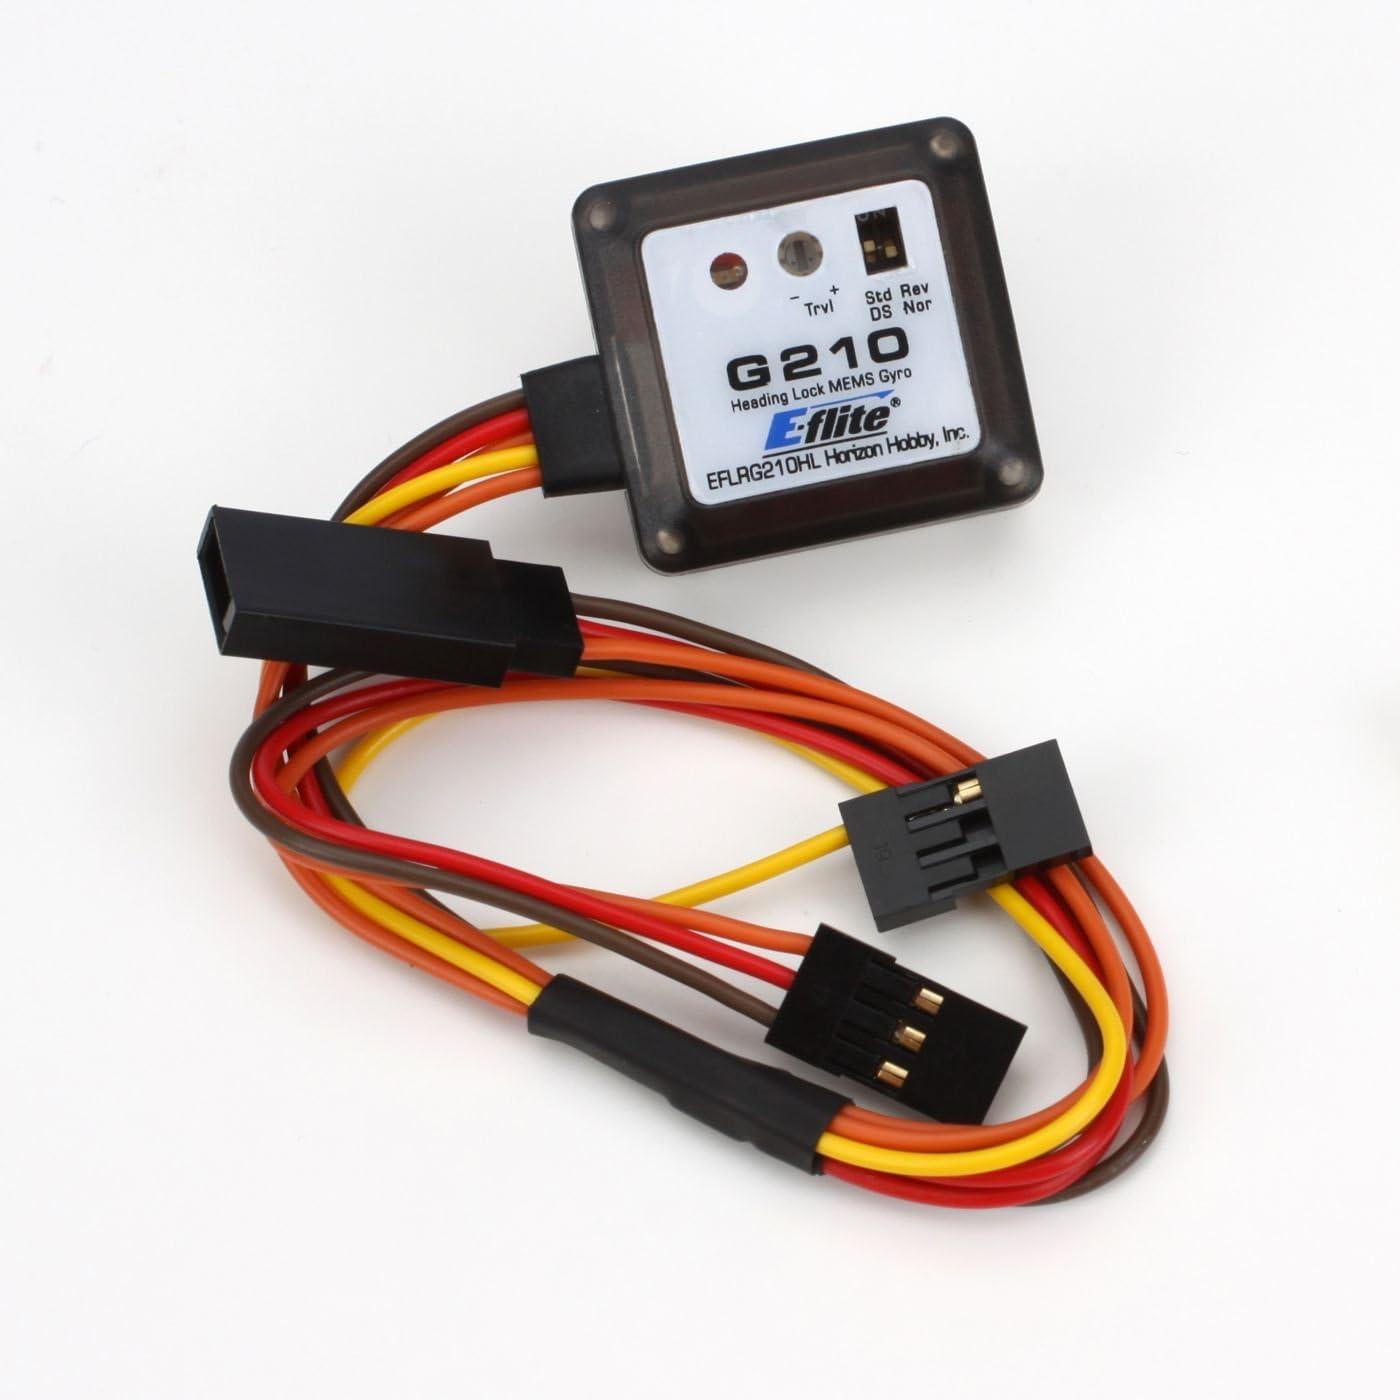 B004P7QGFM E-flite G210HL Micro Heading Lock MEMS Gyro, EFLRG210HL 61Kiz0Sw47L